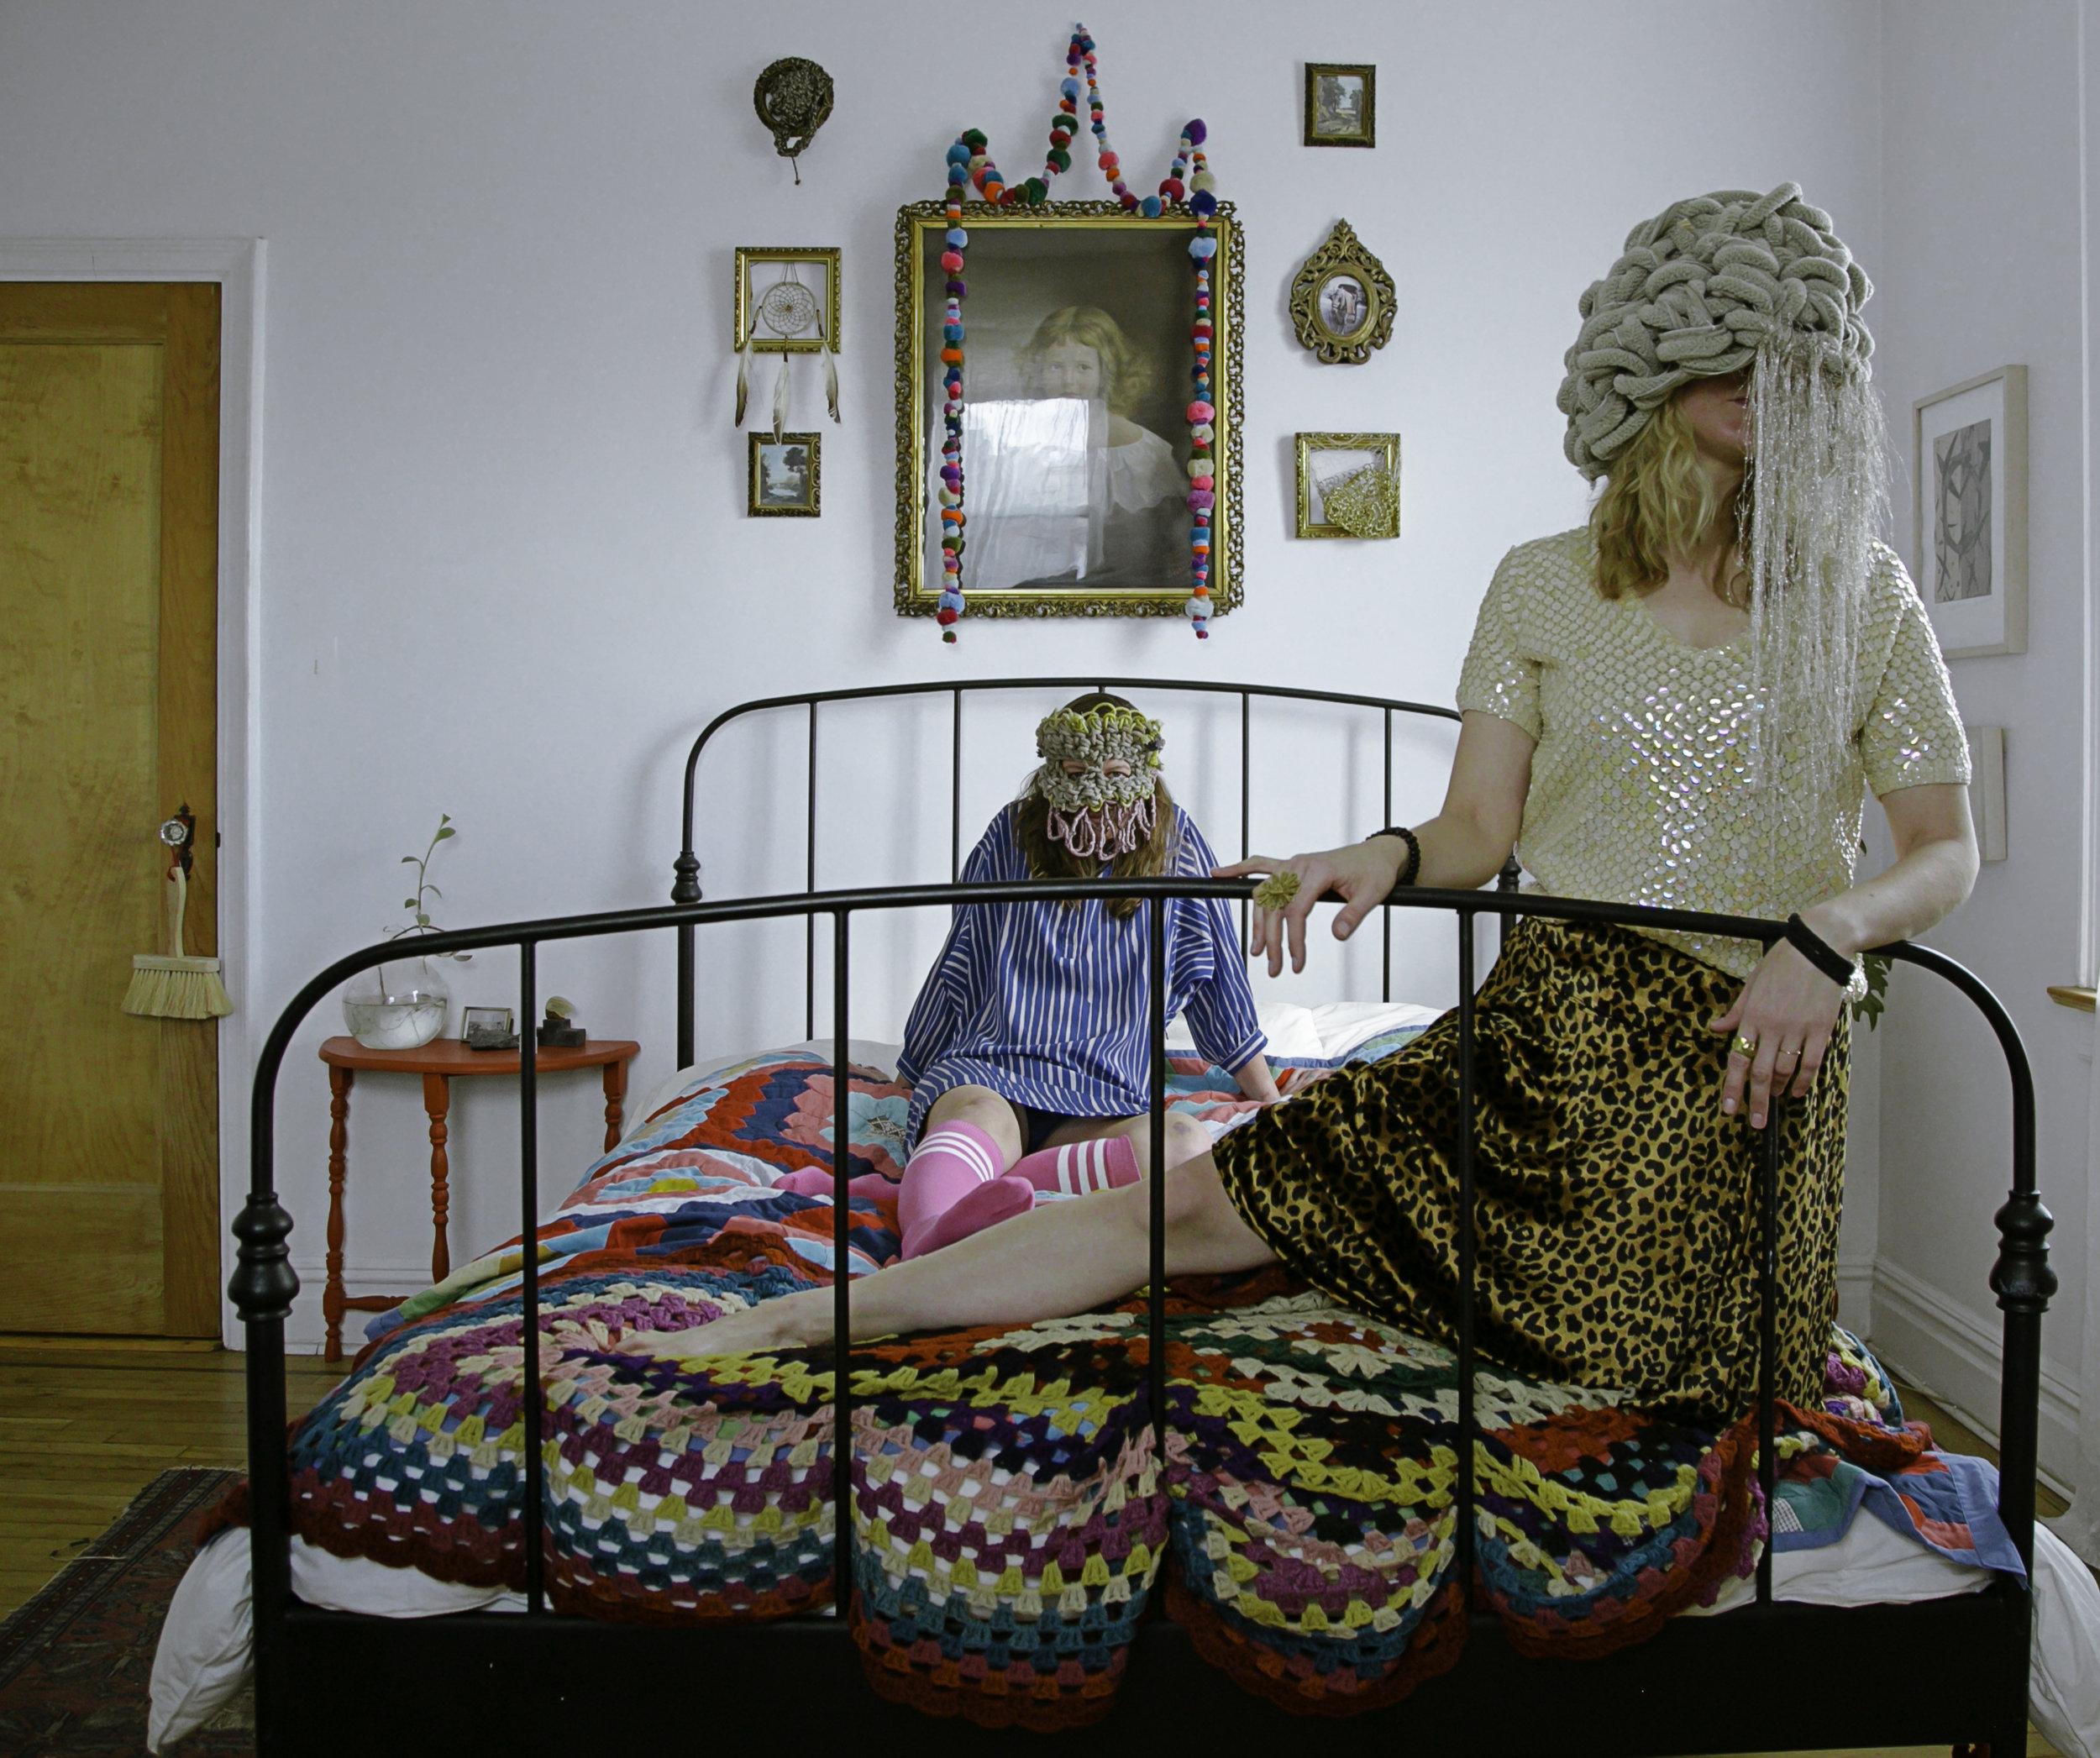 In Bed II, 2018